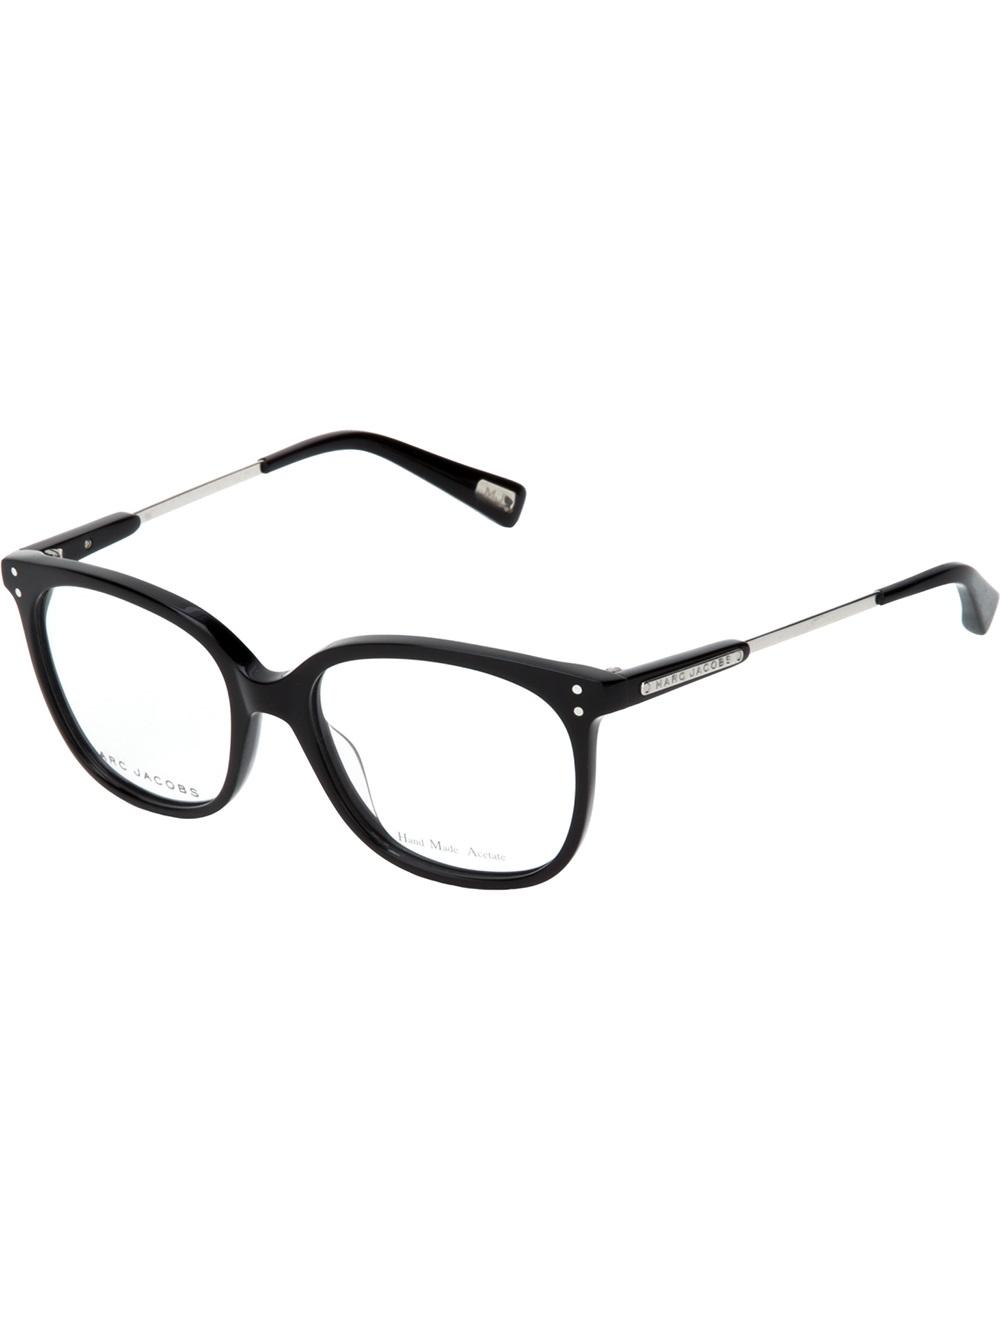 Frame Glasses Marc Jacobs : Marc jacobs Square Frame Glasses in Black Lyst